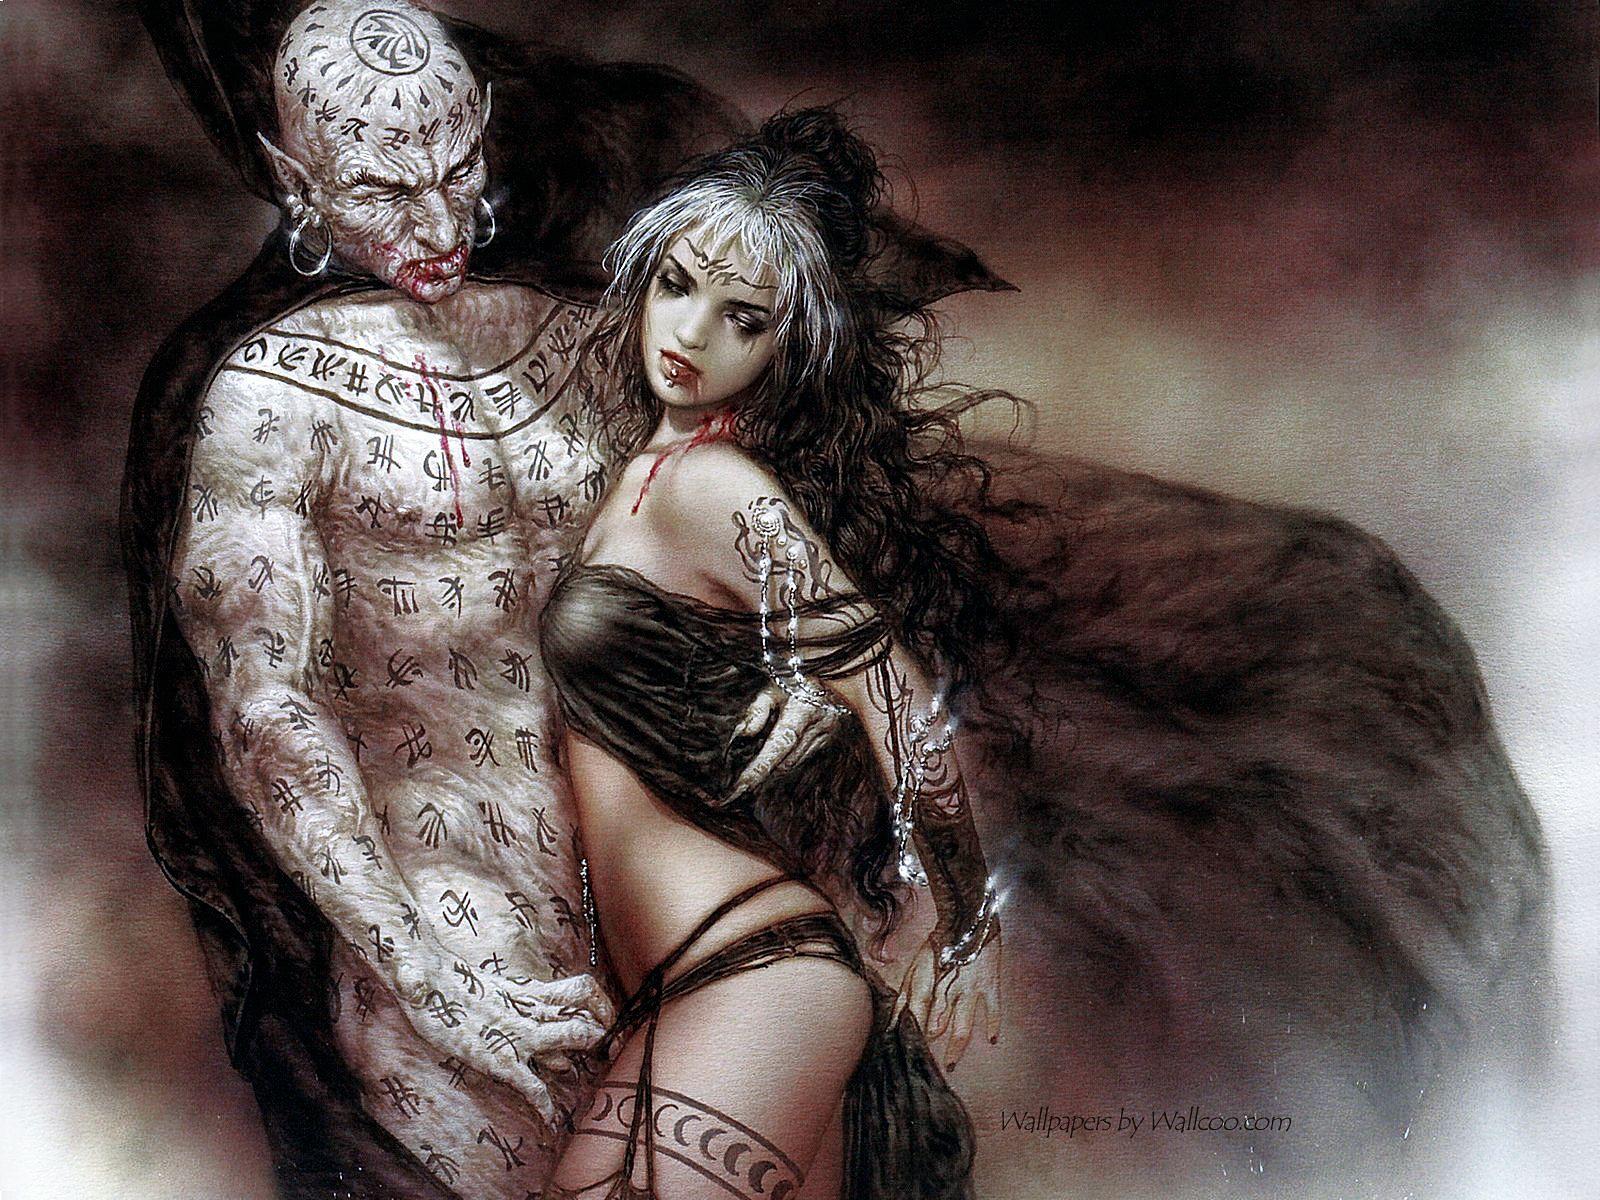 Erotic free downloads